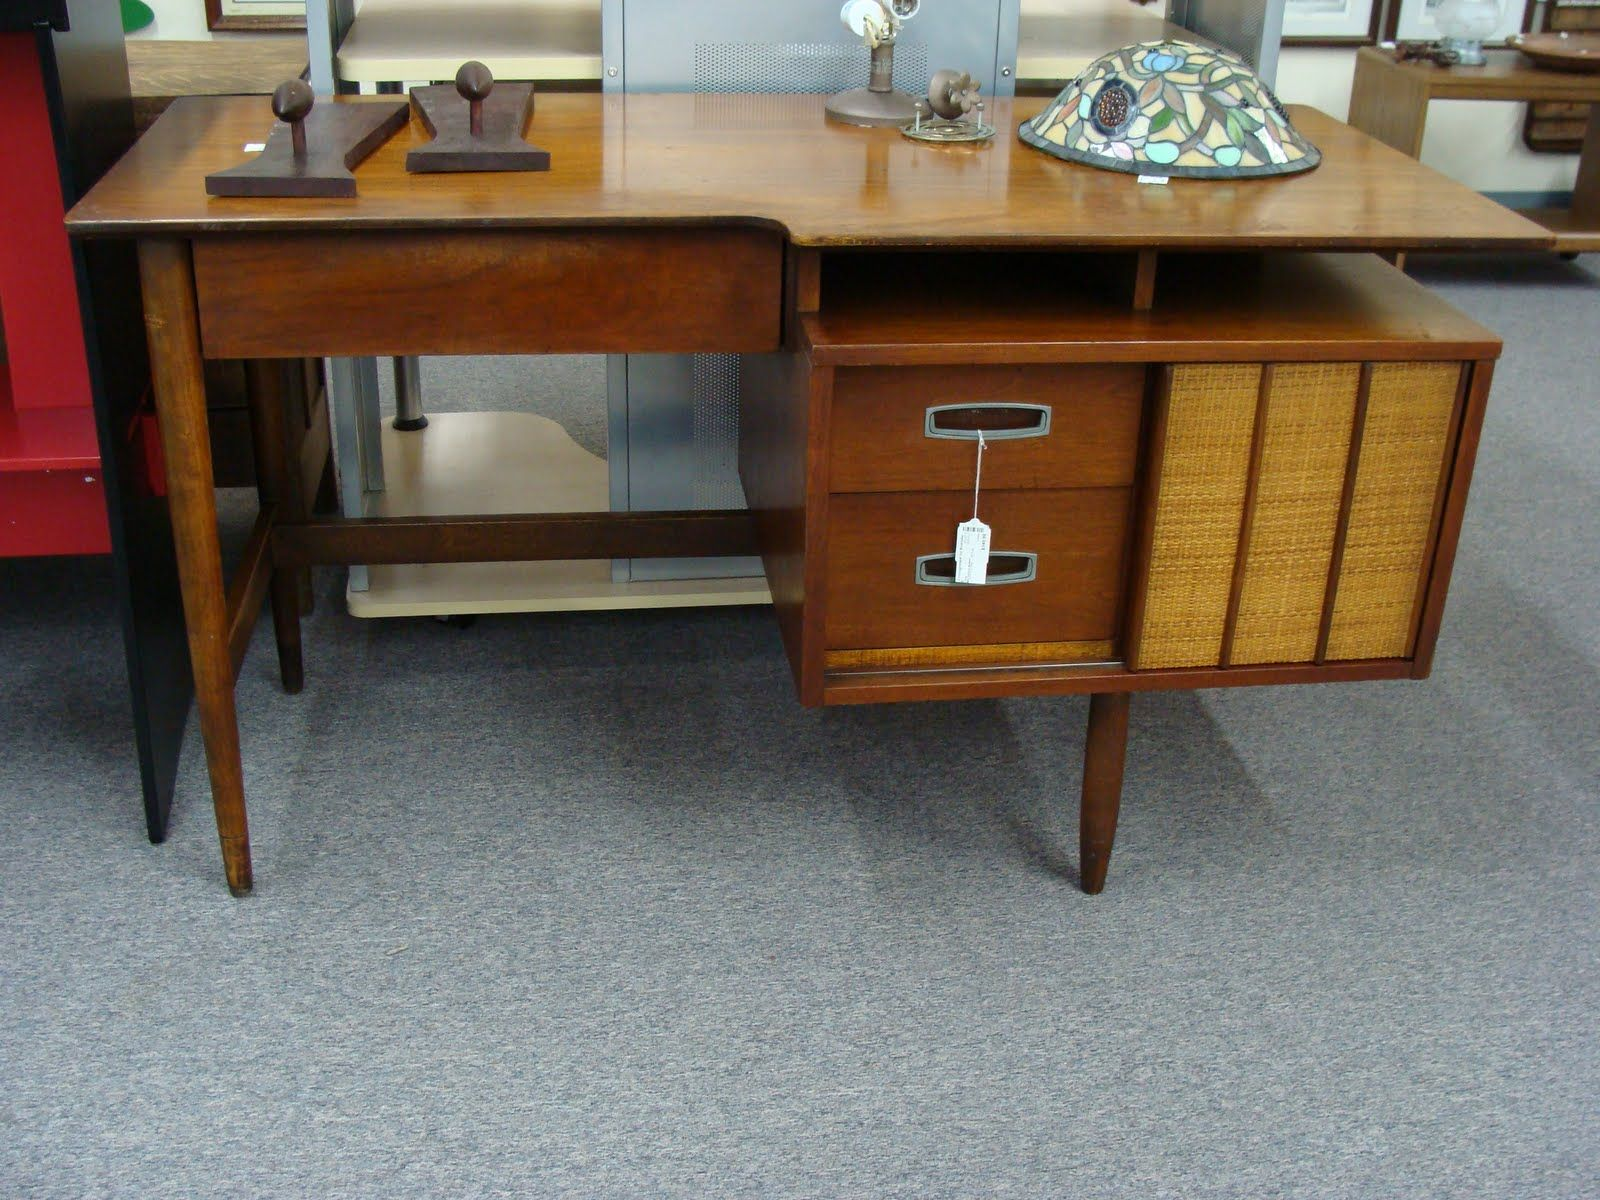 Braxton and yancey mid century danish modern desks and weekend booty